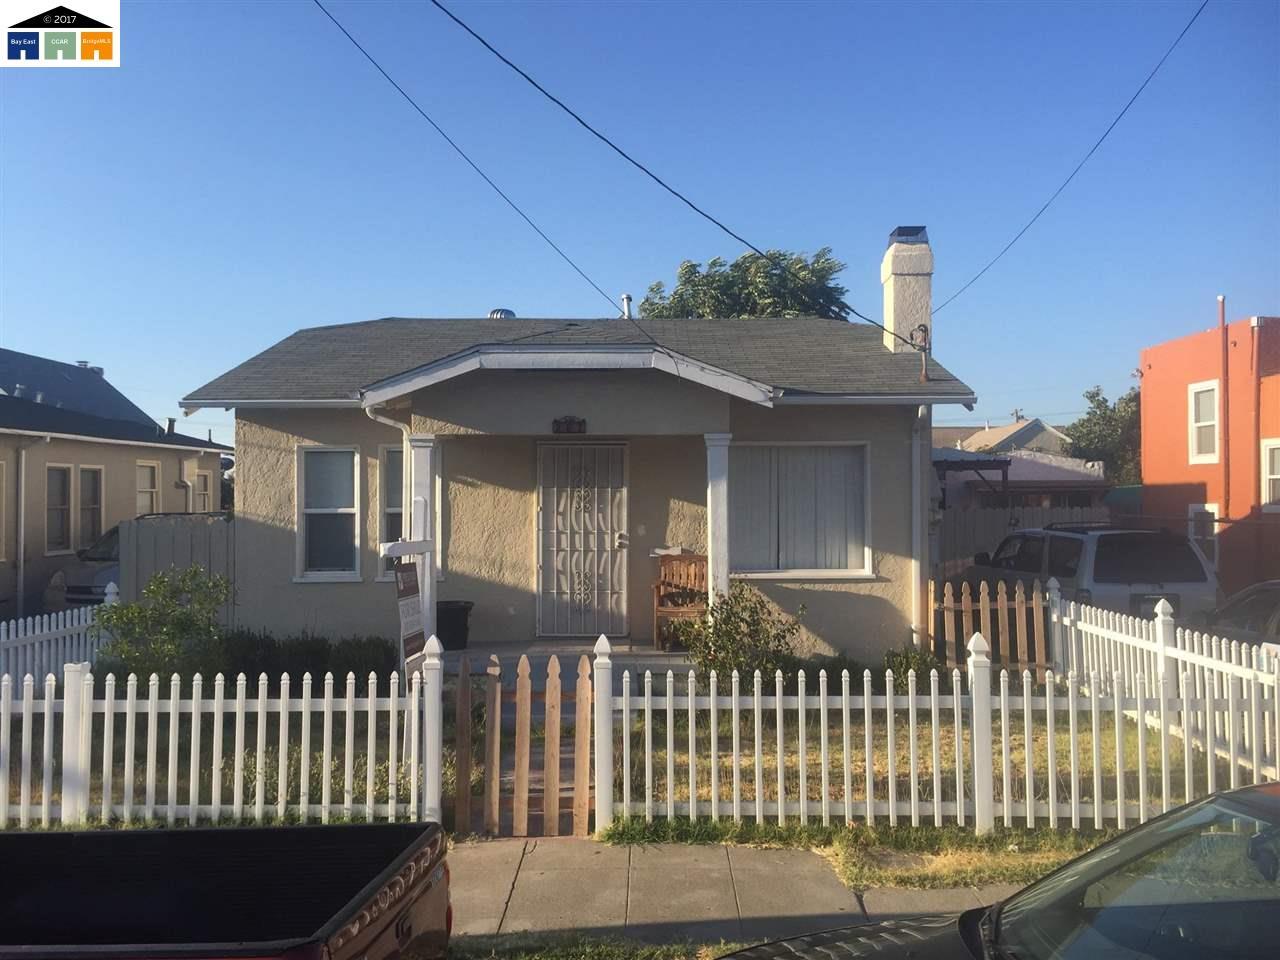 267 E 17th St., PITTSBURG, CA 94565